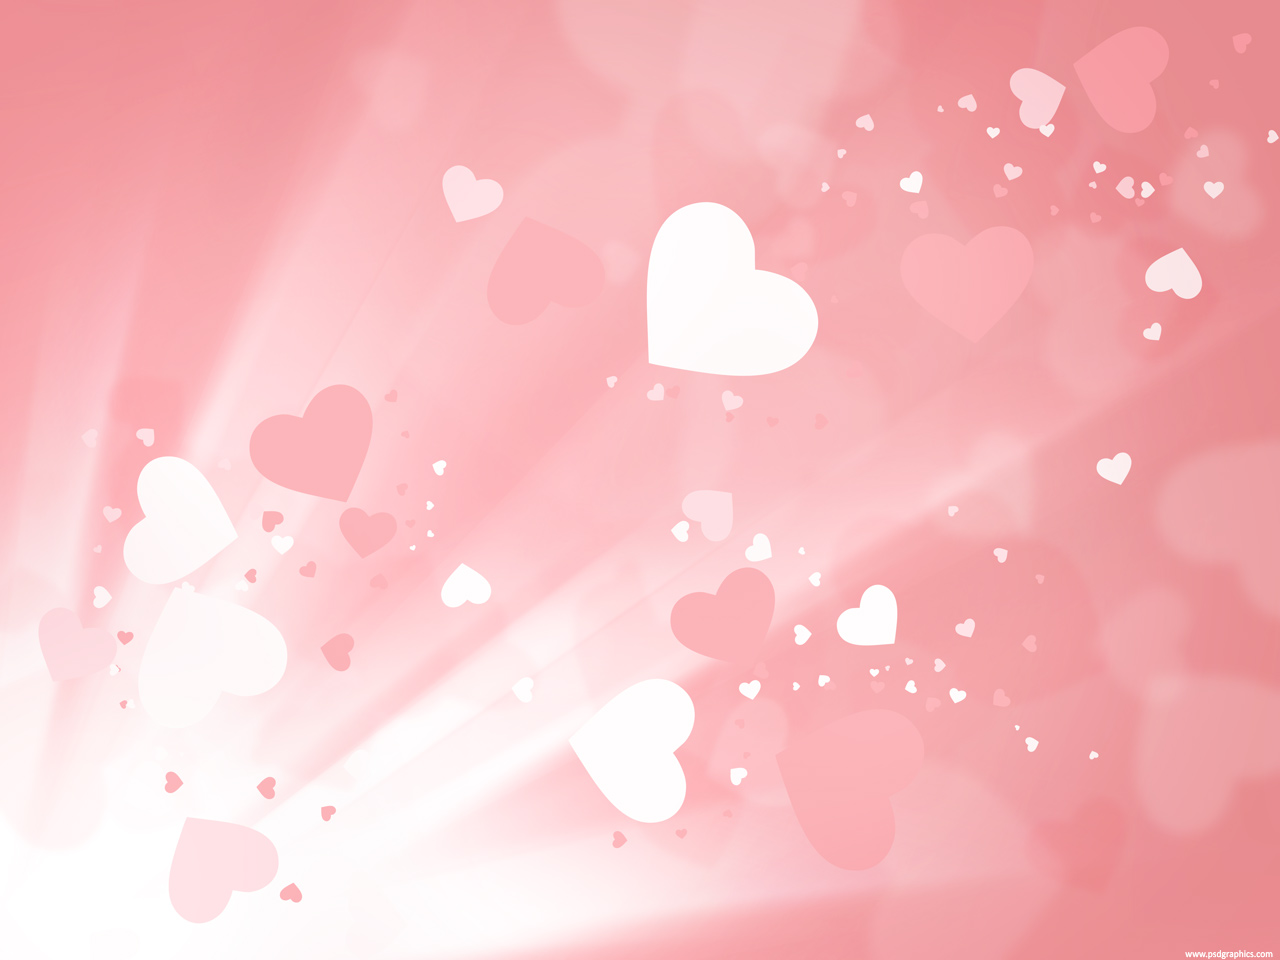 Medium size preview 1280x960px Valentines day background 1280x960